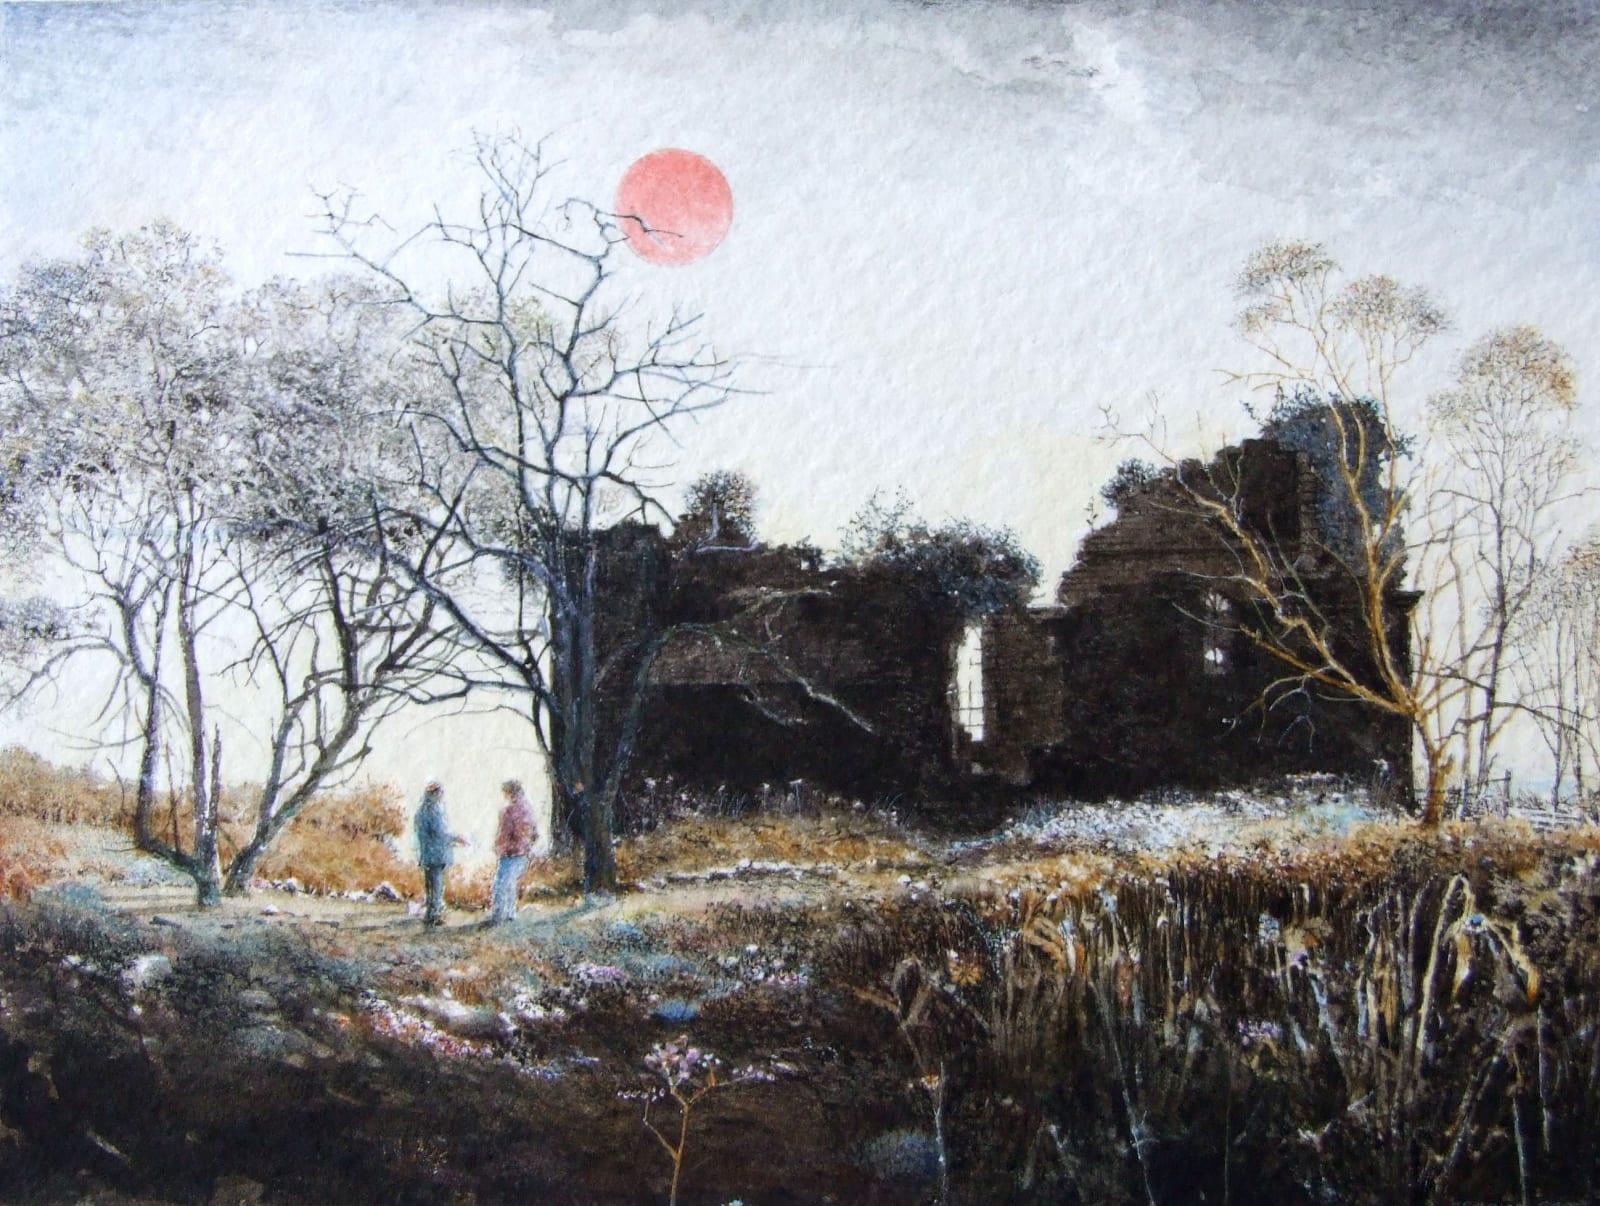 Robert Bates December Afternoon (2007) Watercolour 10.6 x 14.1 cm